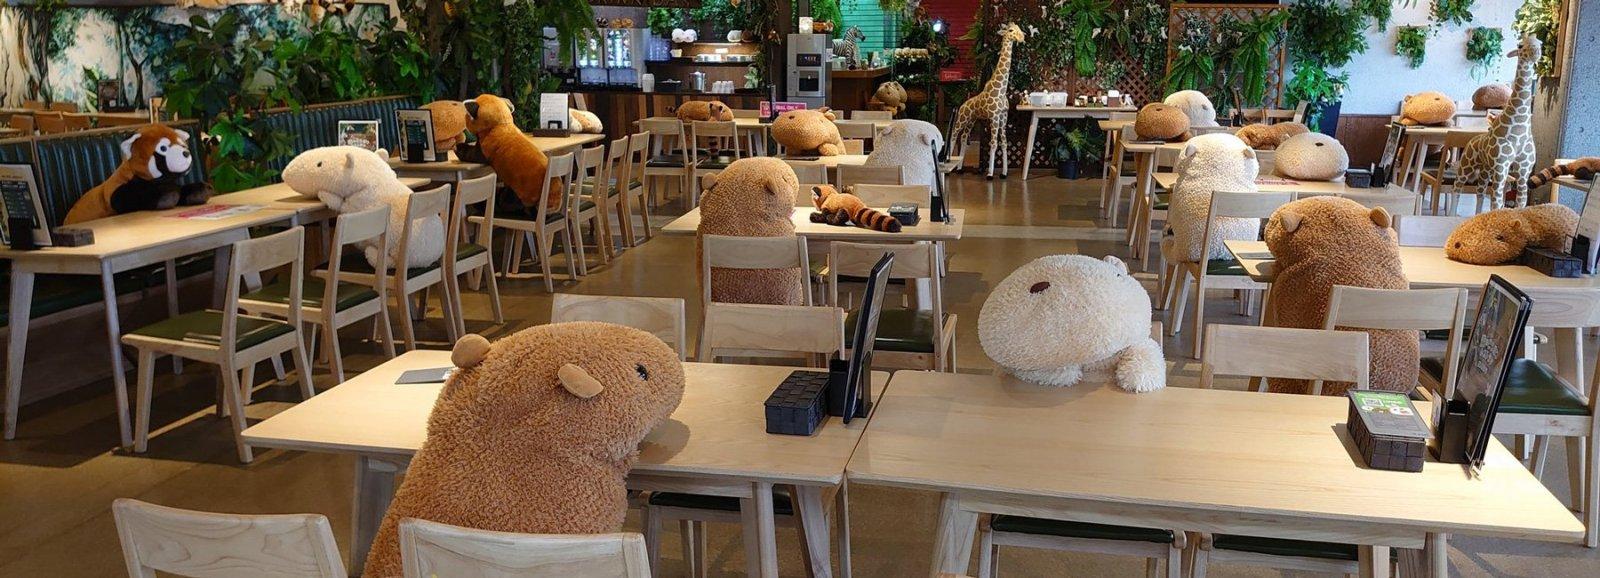 large.japanese-zoo-stuffed-animal-capyba